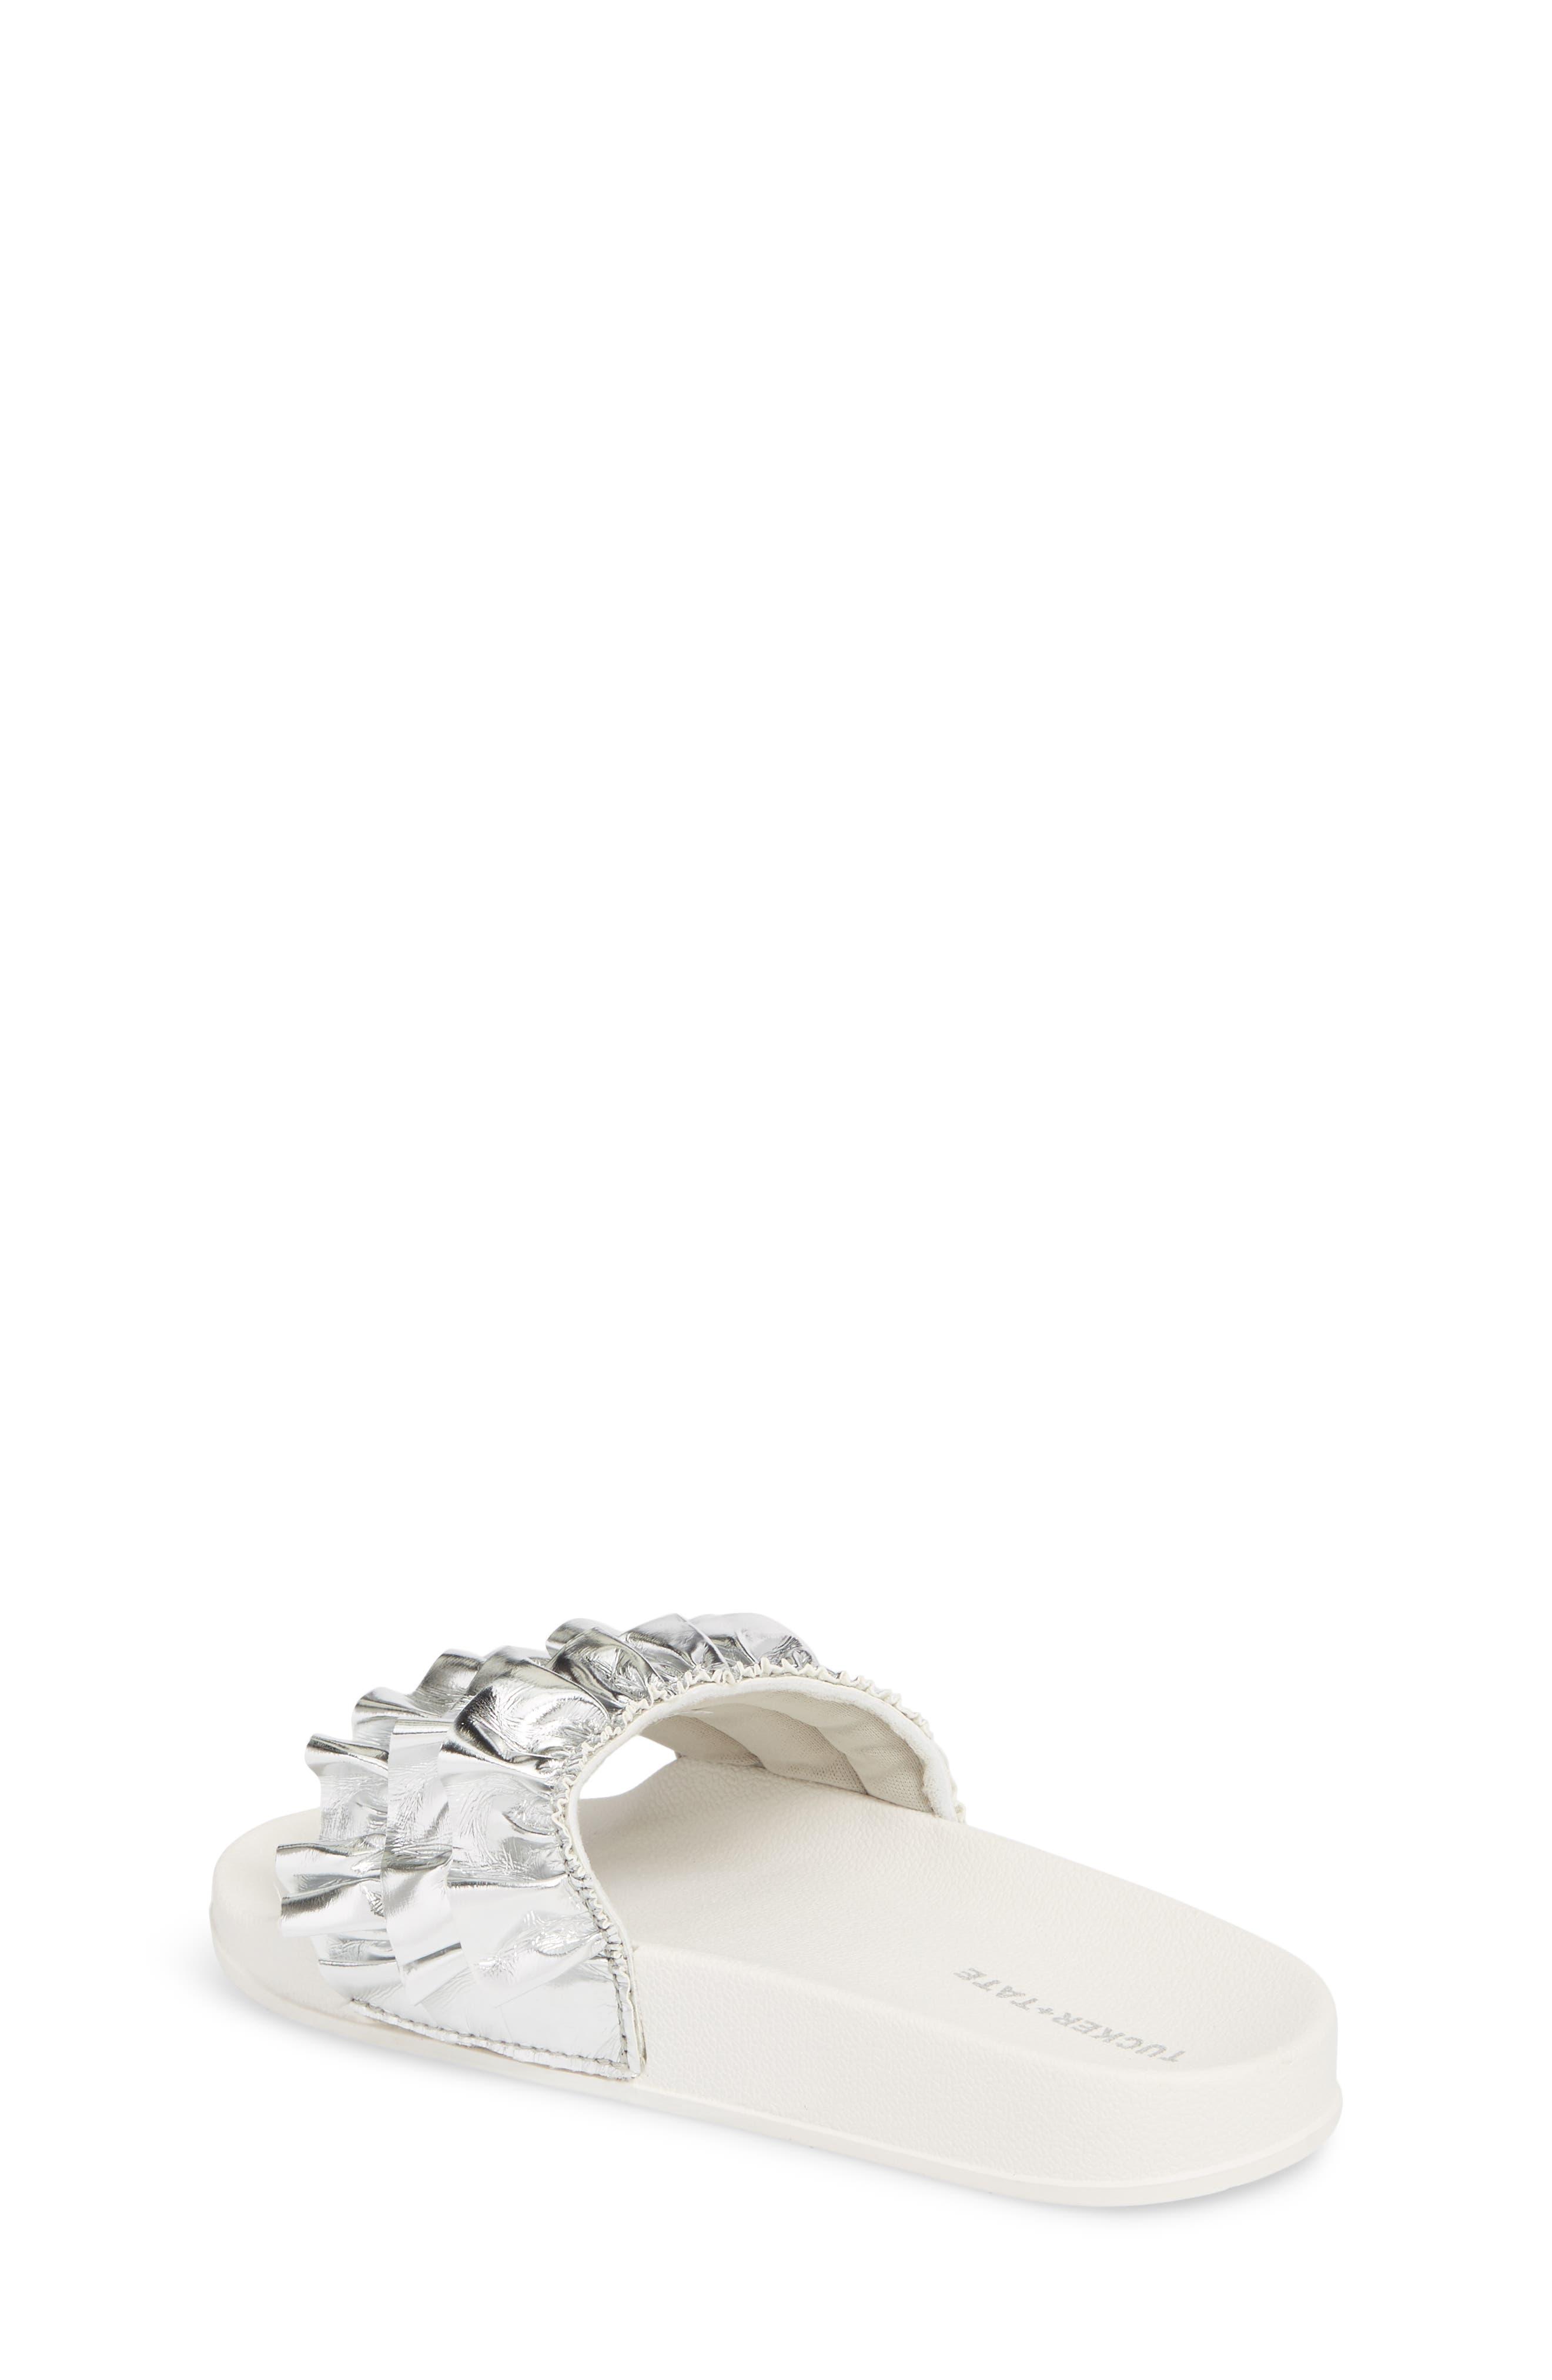 Metallic Ruffle Slide Sandal,                             Alternate thumbnail 2, color,                             Silver Faux Leather